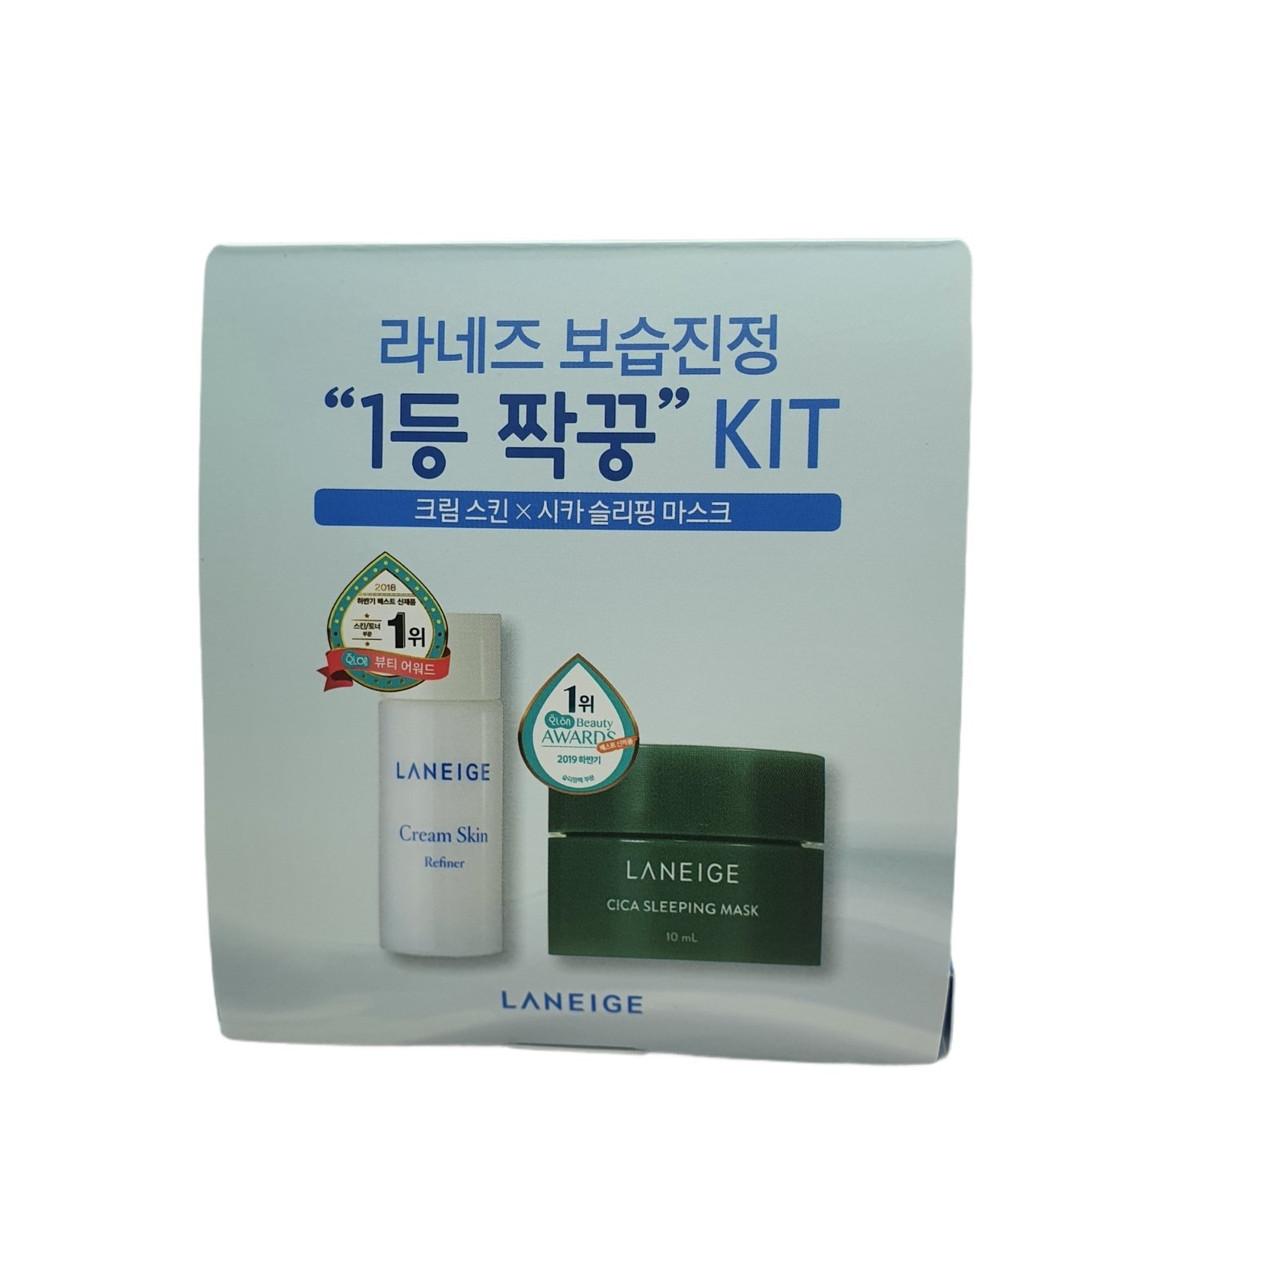 Laneige Skin Care Набір мініатюр (2 шт.)